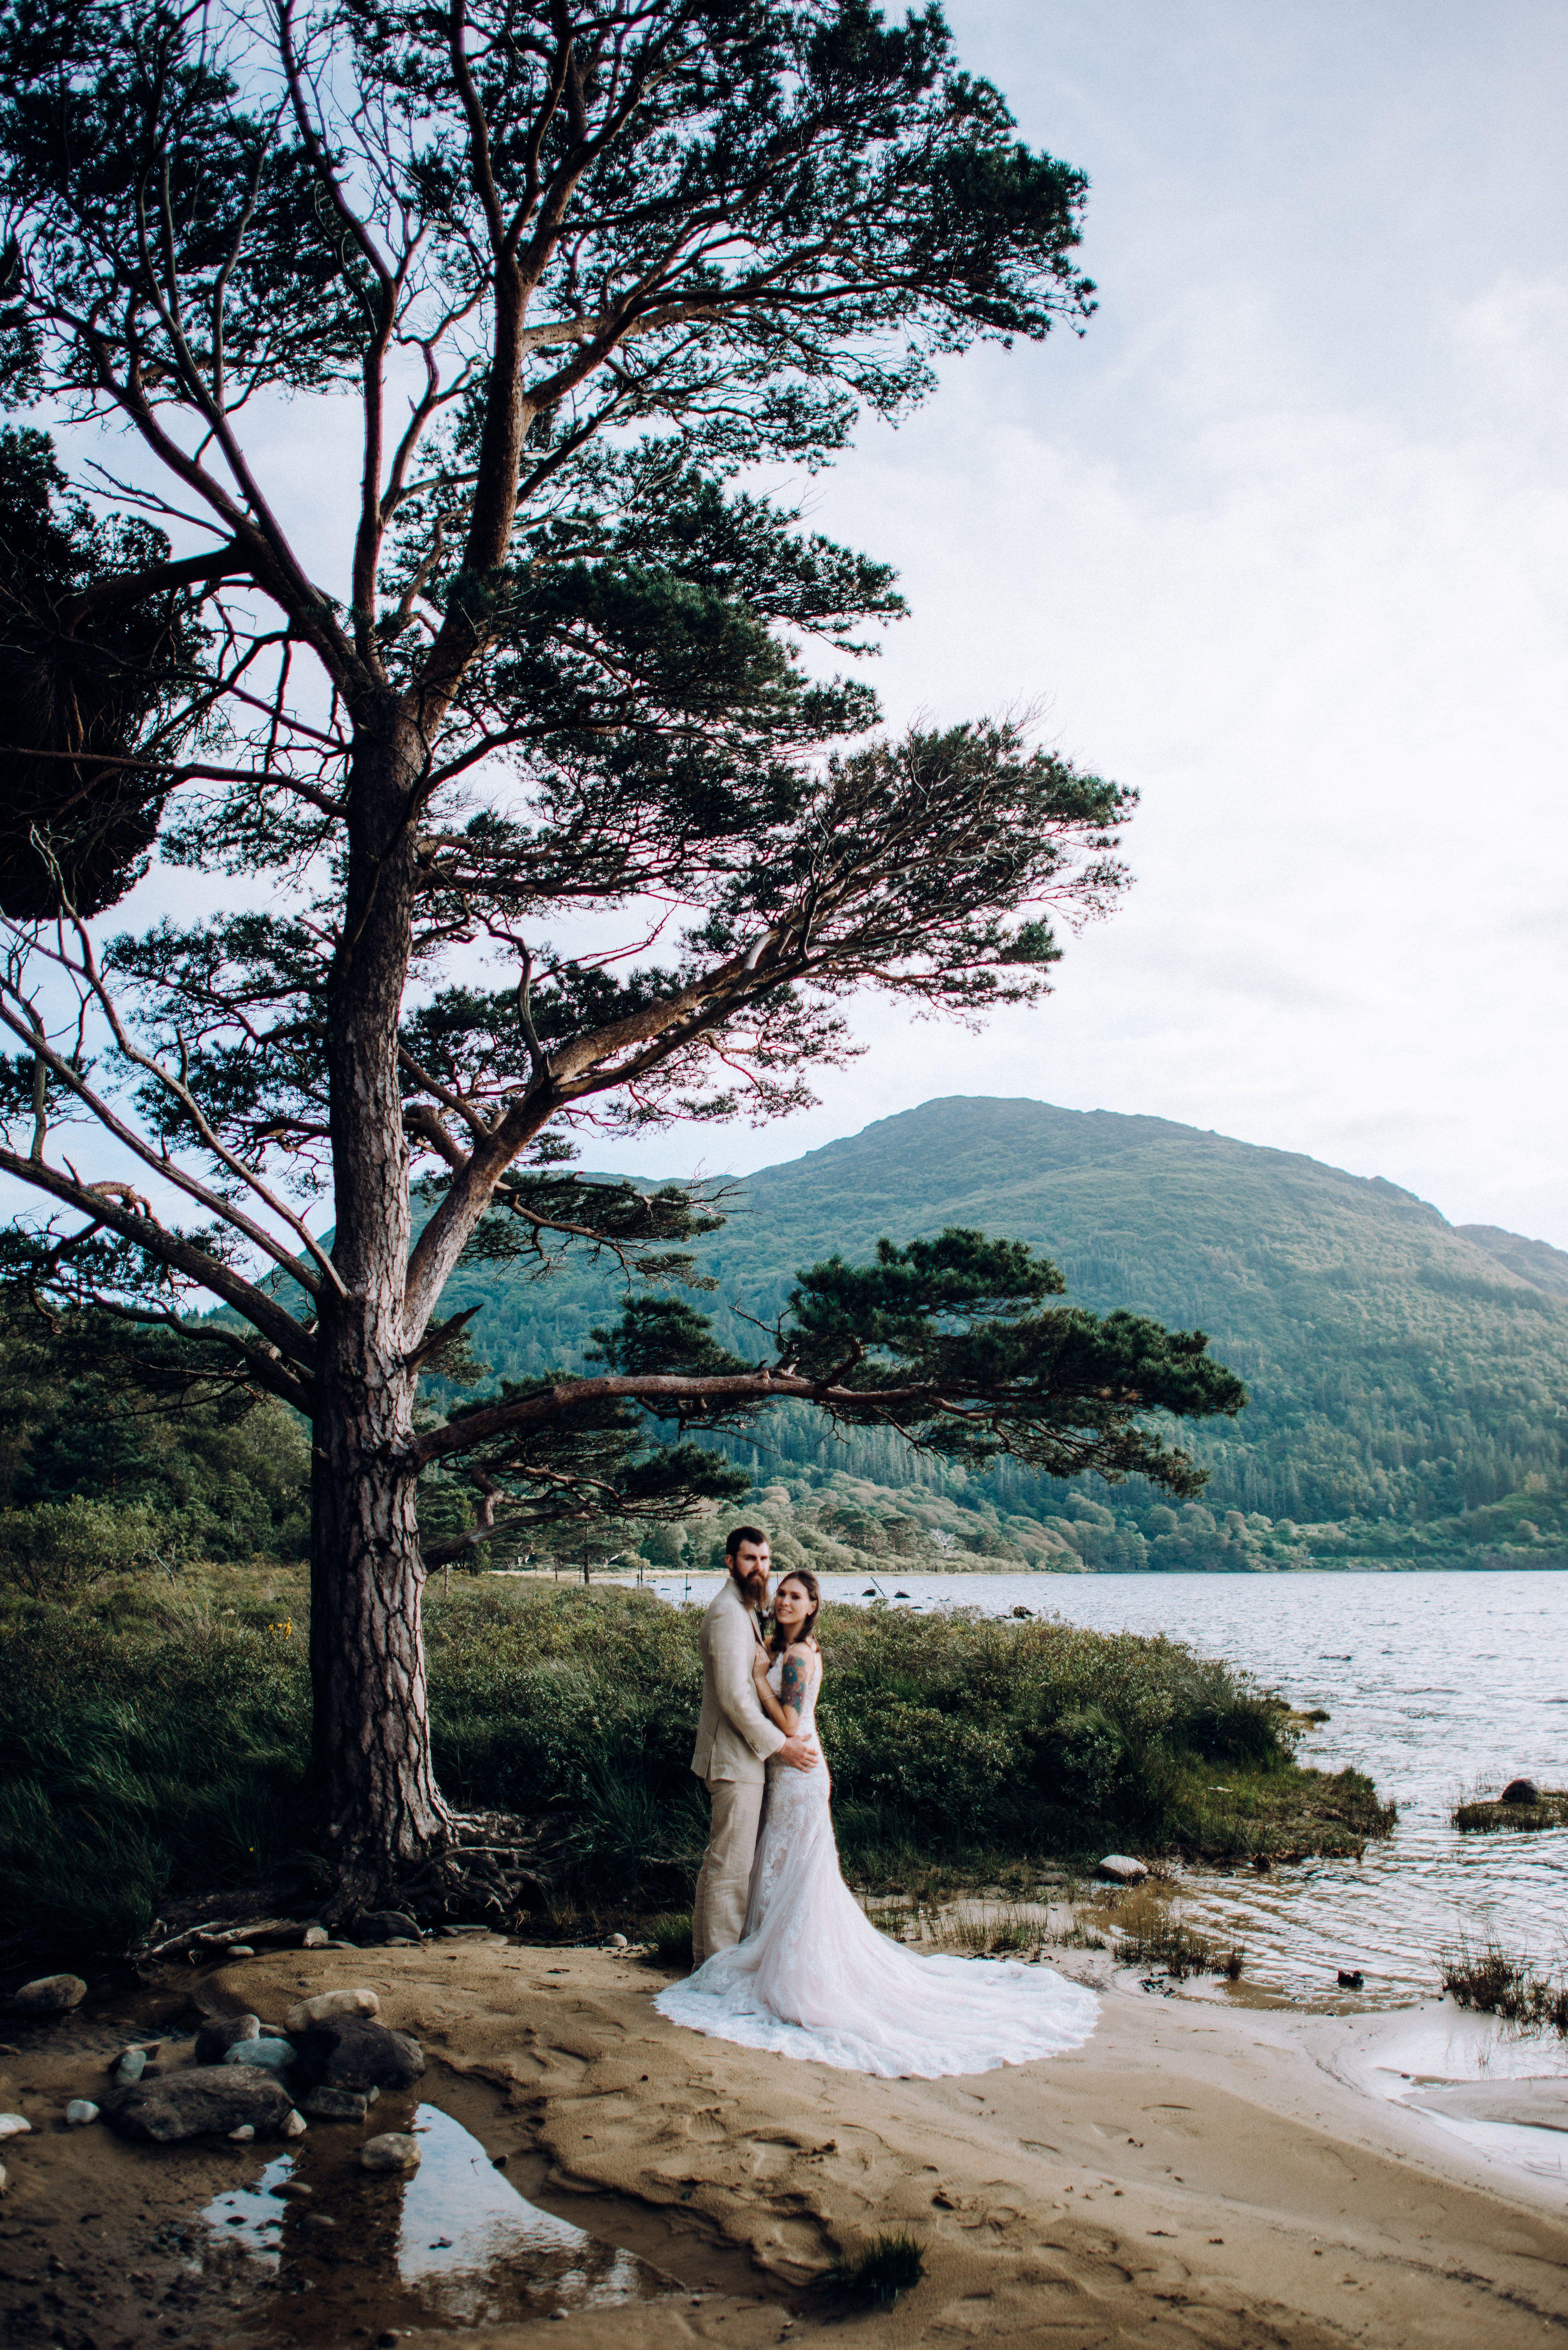 Wedding Venues in Ireland - Best Irish wedding venues ...